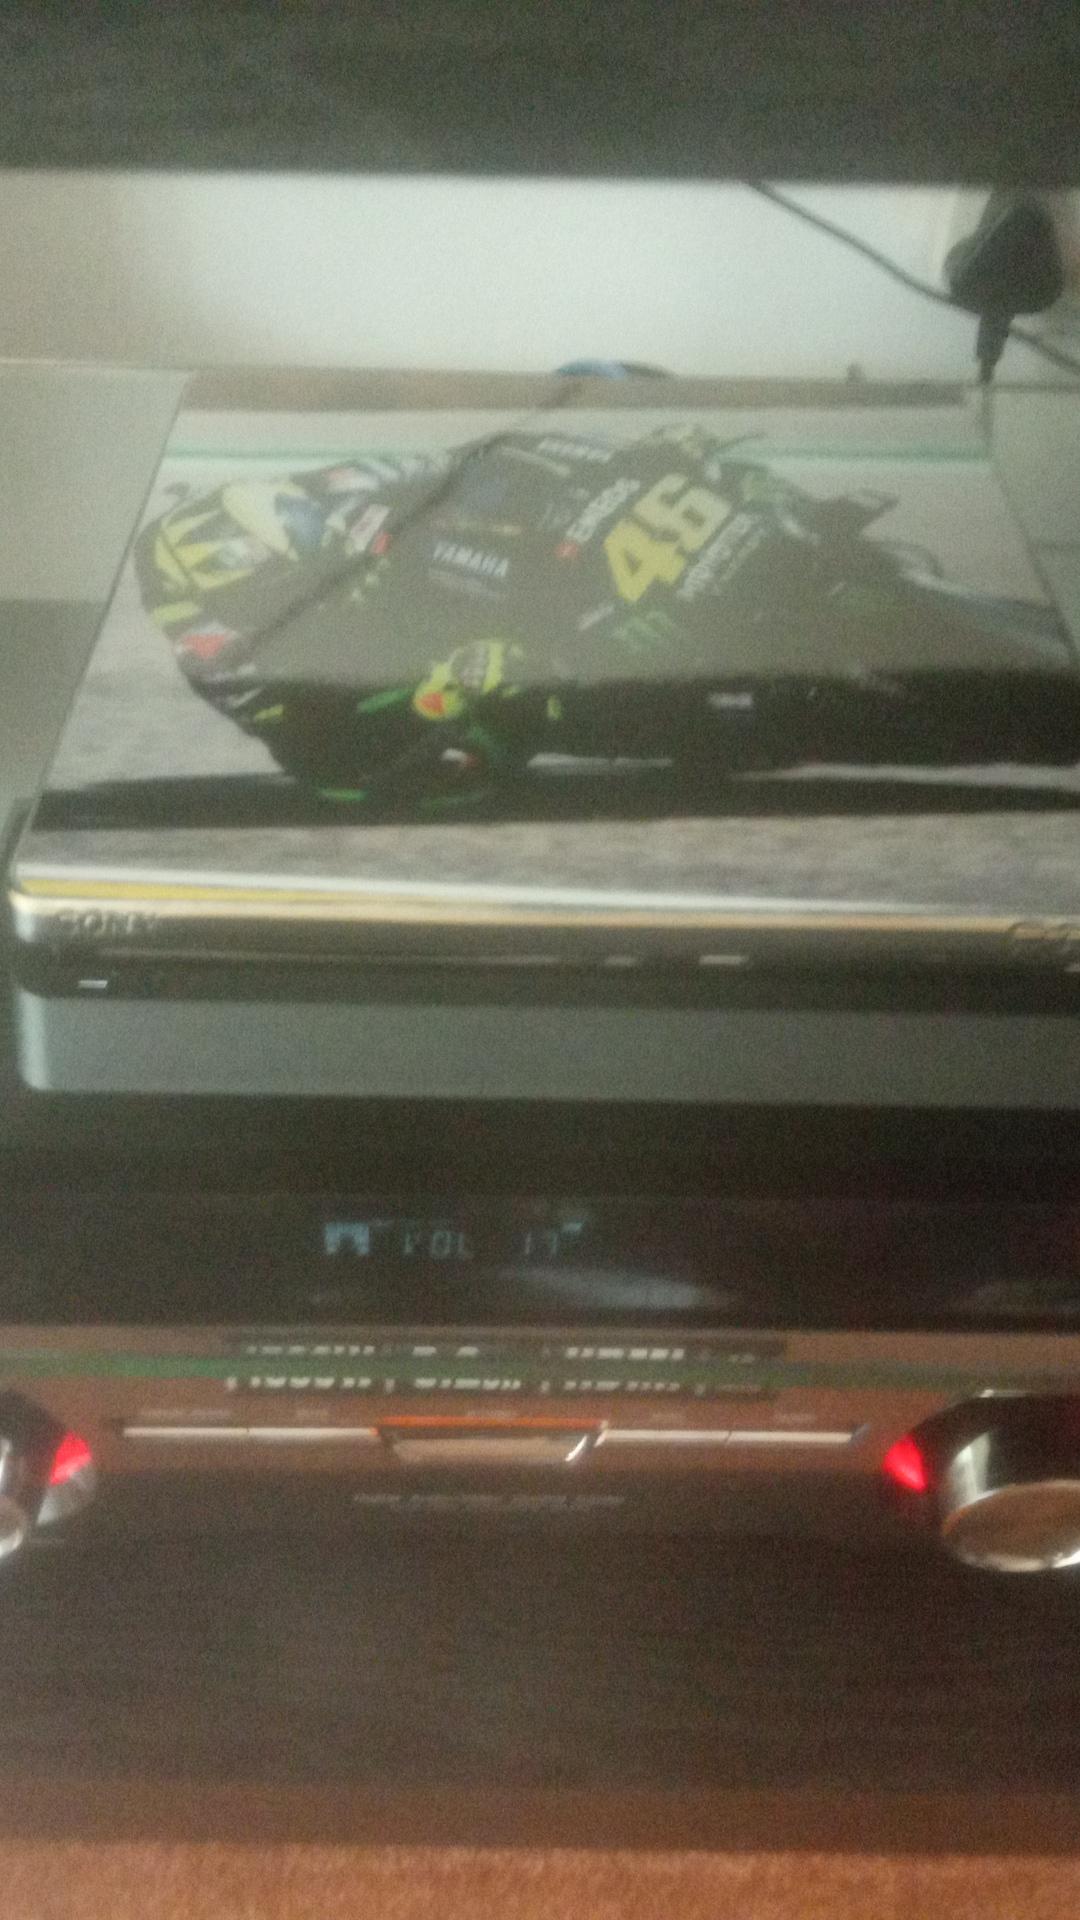 PS4 slim urgent sale